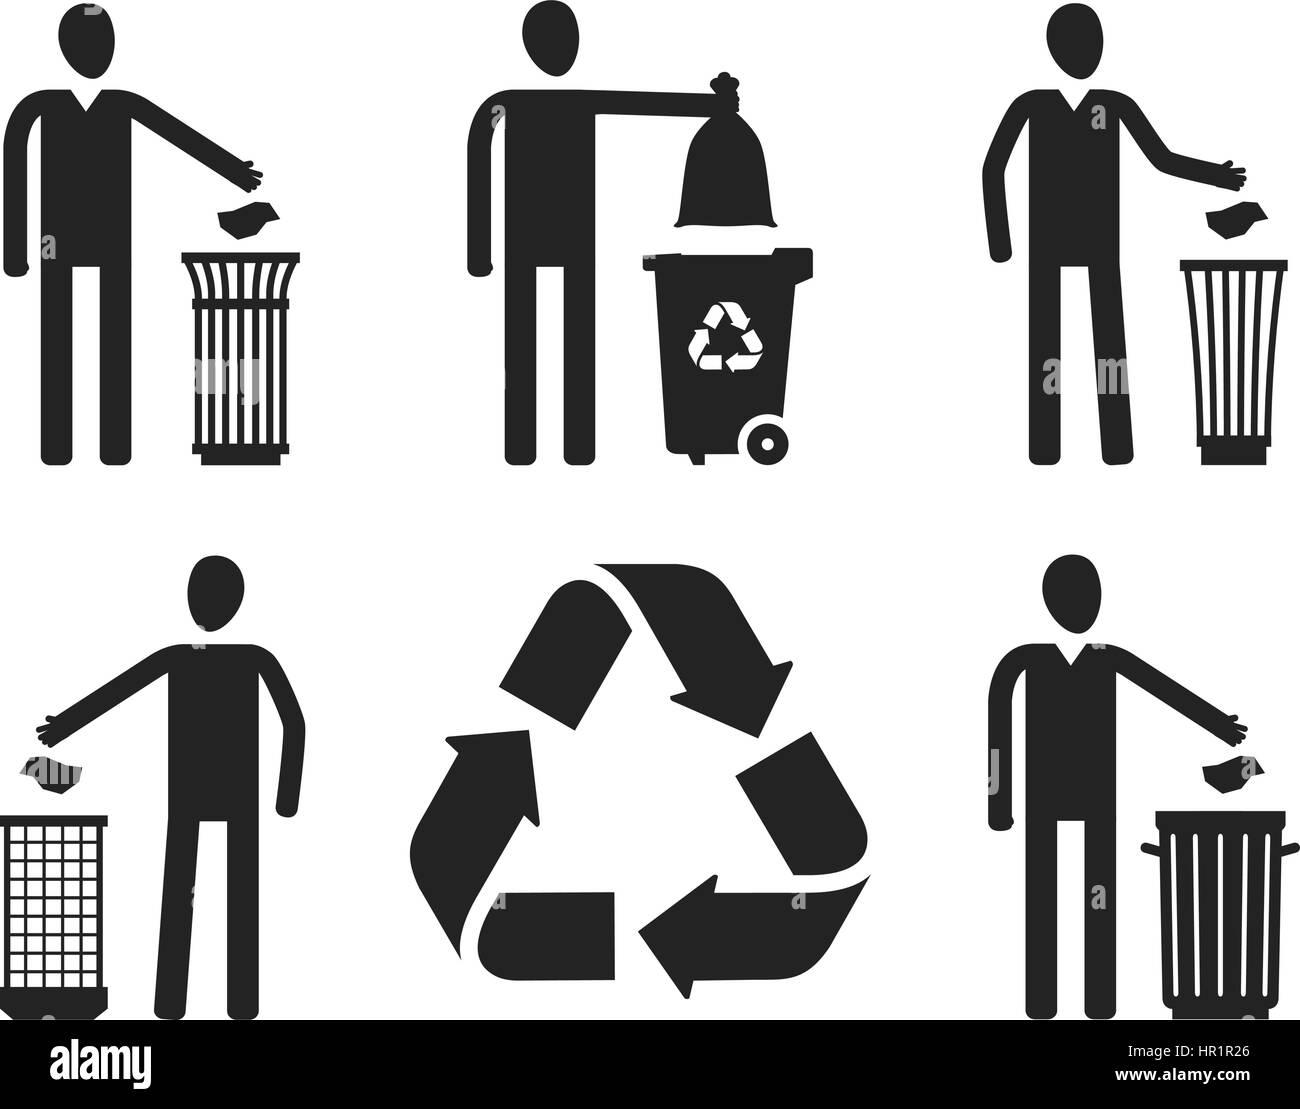 Recycling Symbols Stock Photos Recycling Symbols Stock Images Alamy